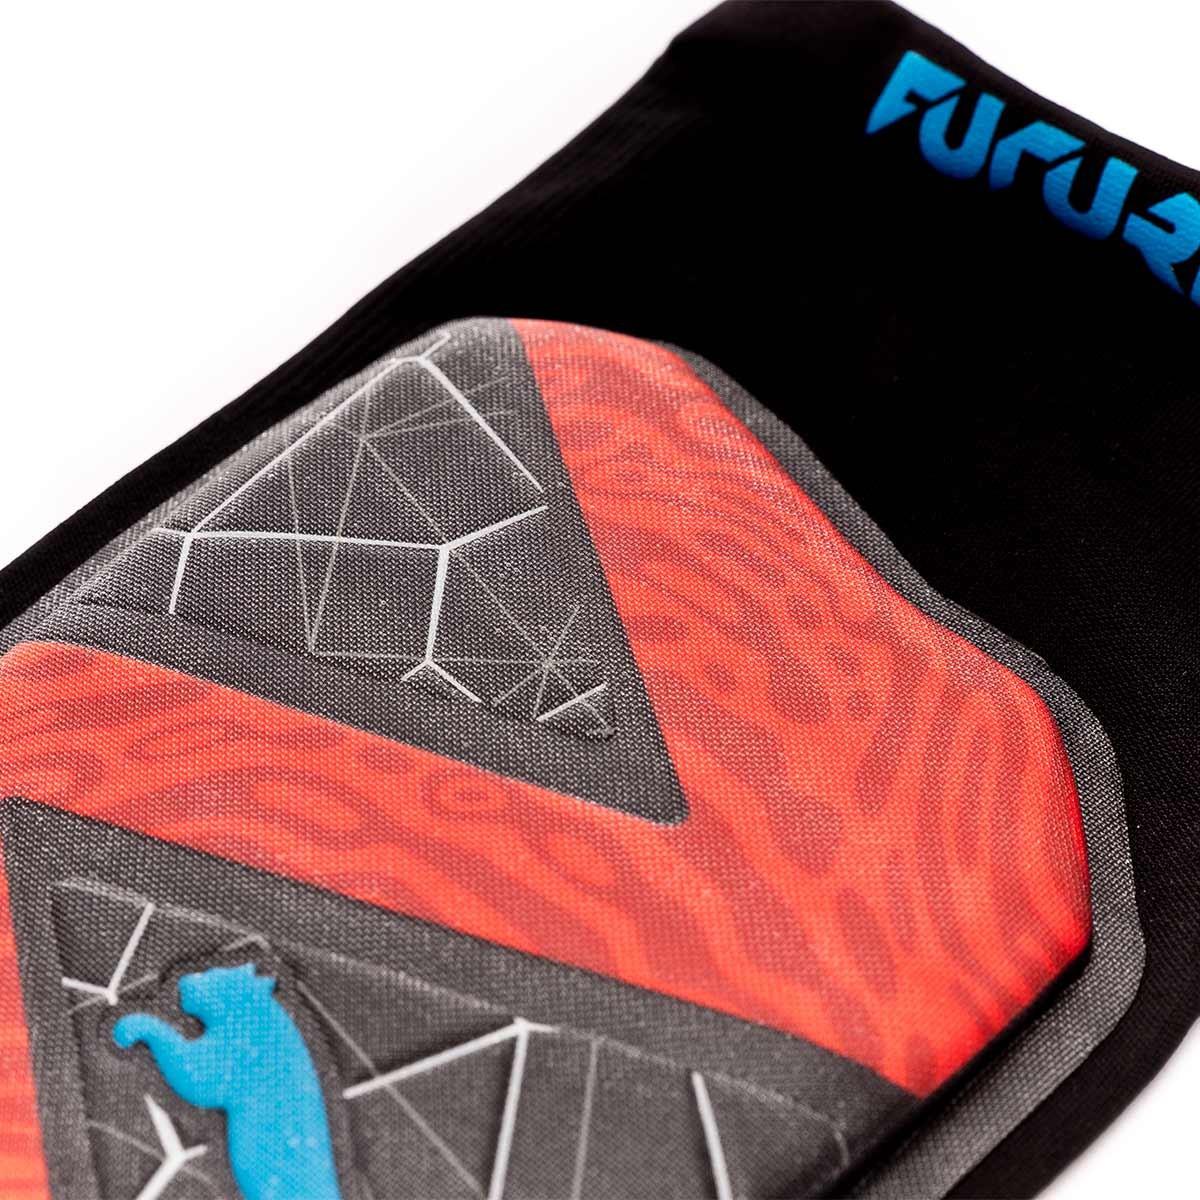 algodón Becks hipoteca  Shinpads Puma Future 19.1 Red blast-Black-Bleu azur - Football store Fútbol  Emotion